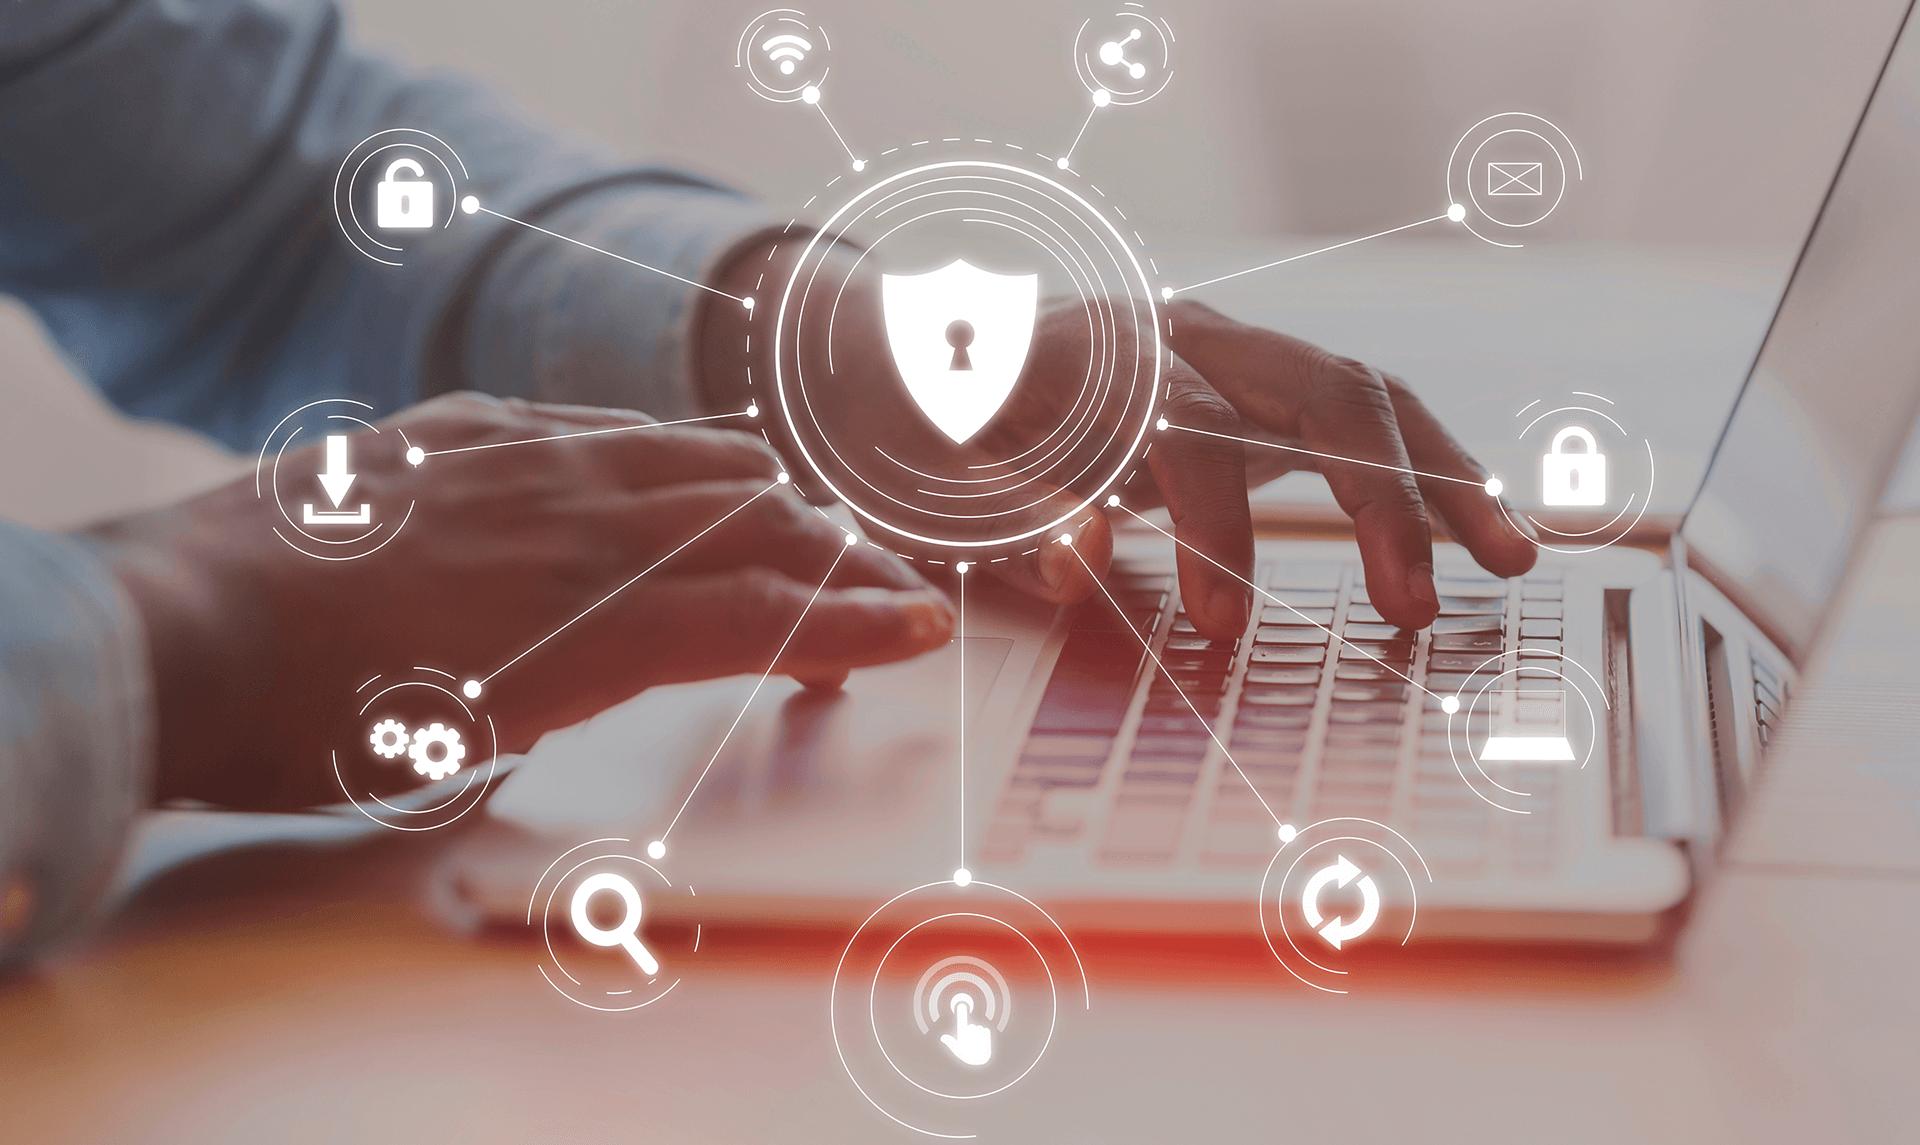 Google Workspaceのセキュリティと信頼性を徹底解説